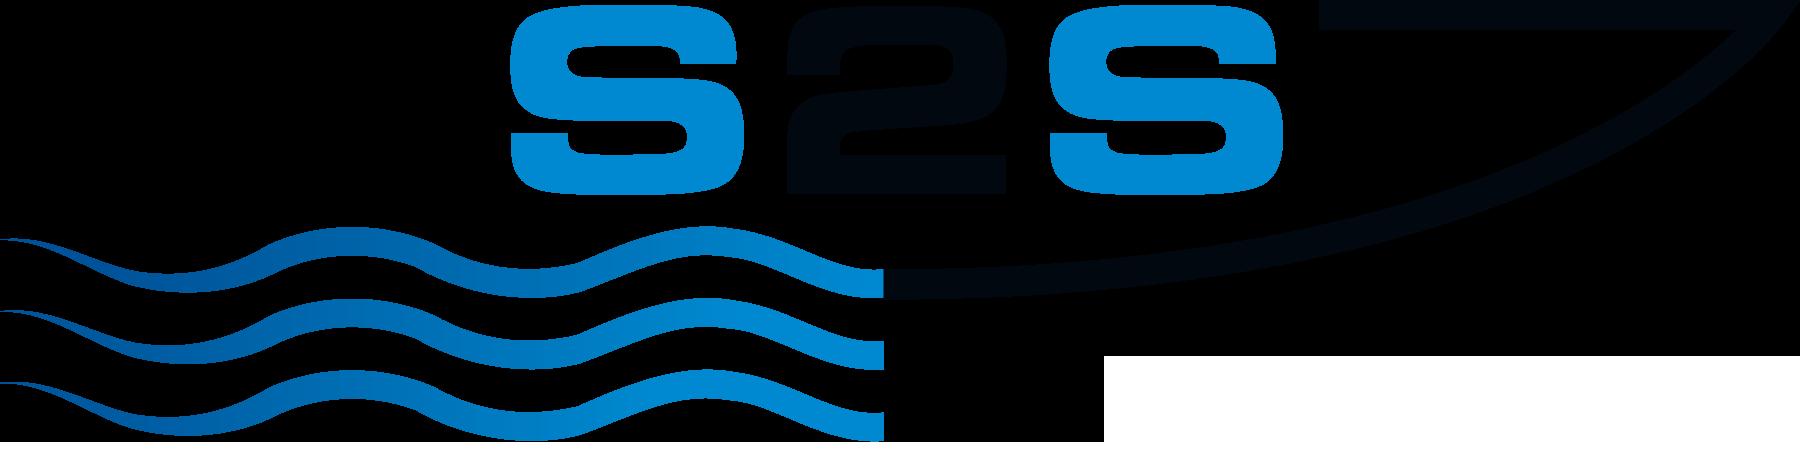 Stem 2 Stern Logo